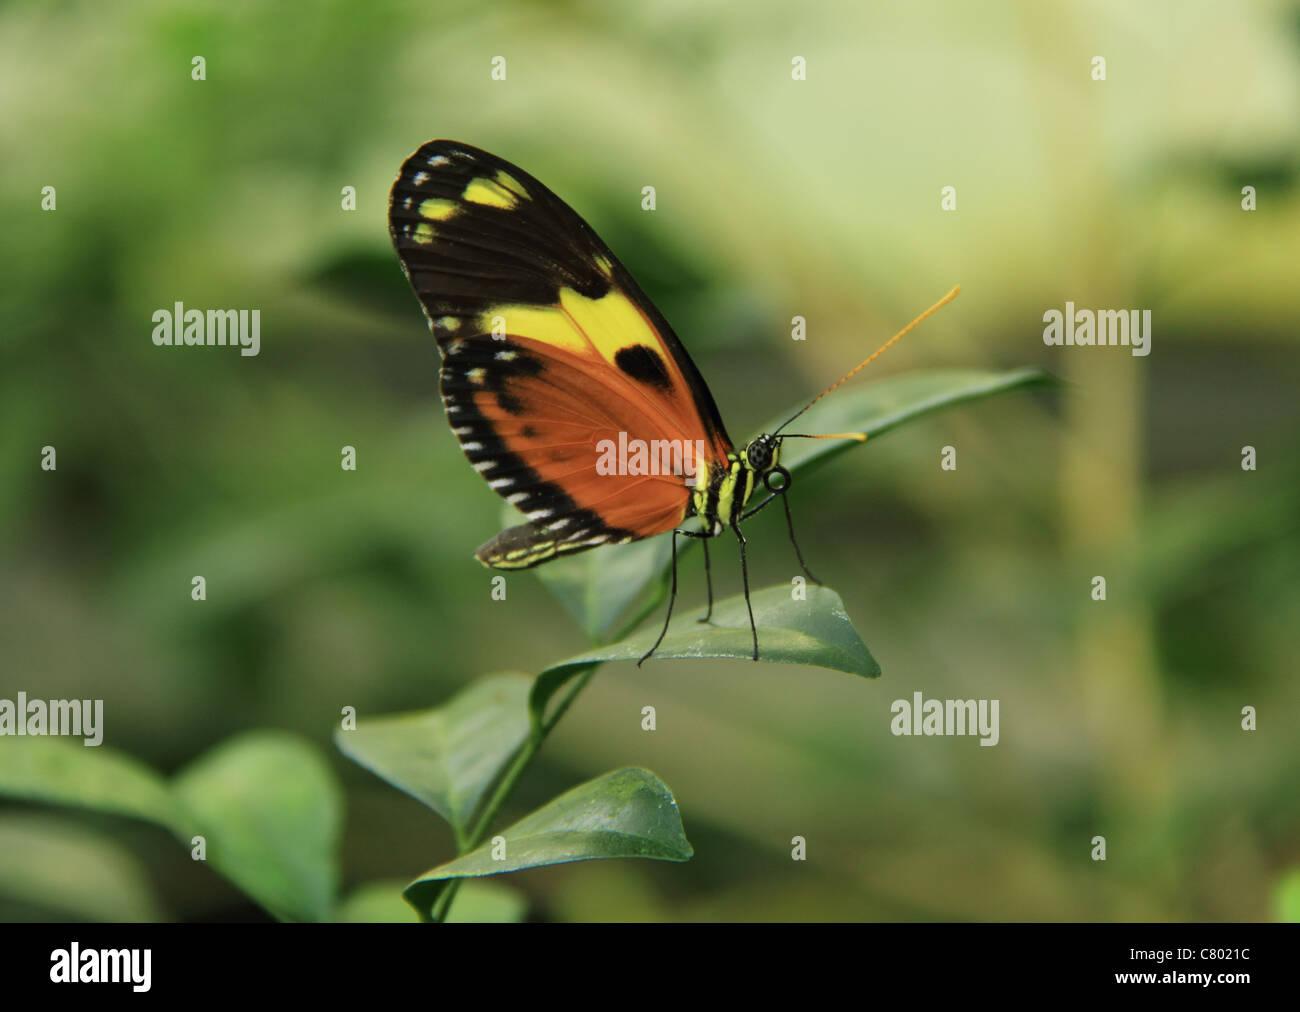 tropical butterfly caterpillar stockfotos tropical butterfly caterpillar bilder alamy. Black Bedroom Furniture Sets. Home Design Ideas